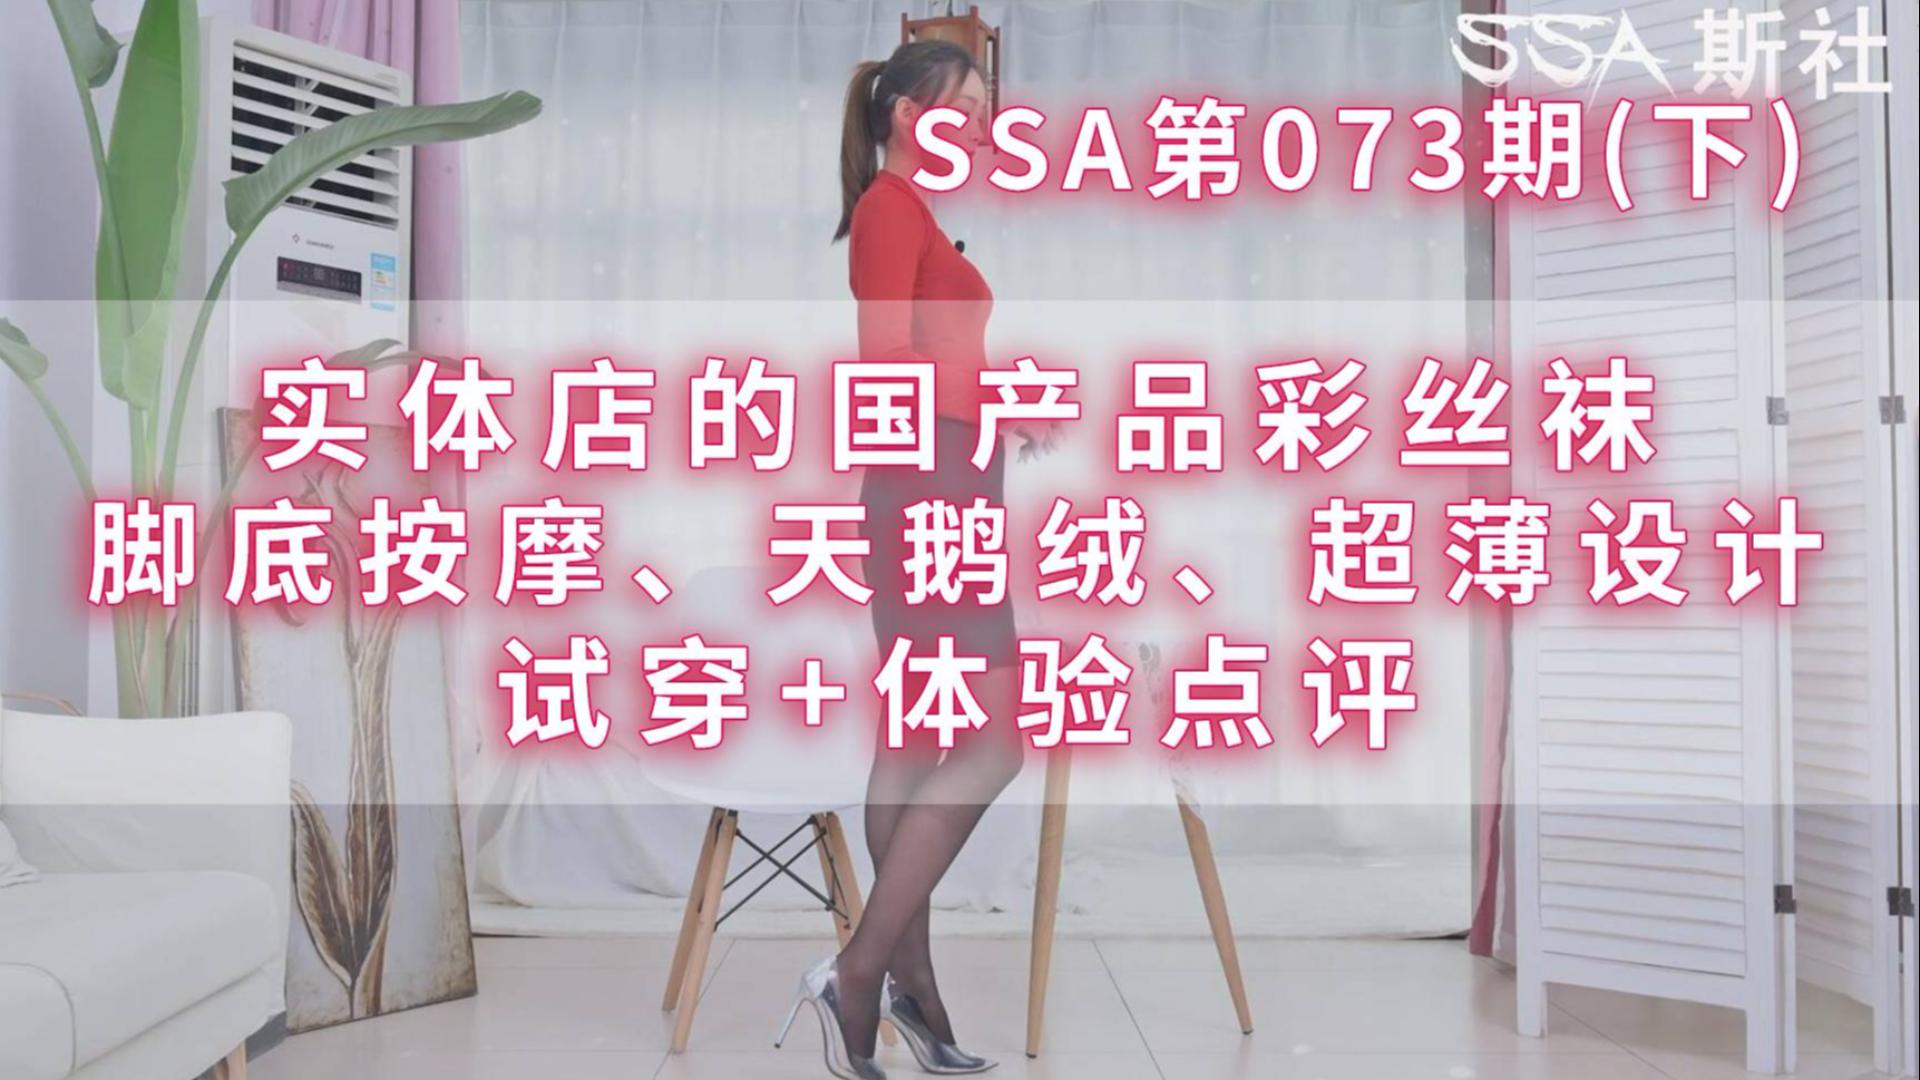 【SSA】模特试穿中国国产品彩连裤袜,猛男勿看上身效果(下)(73期删减版)